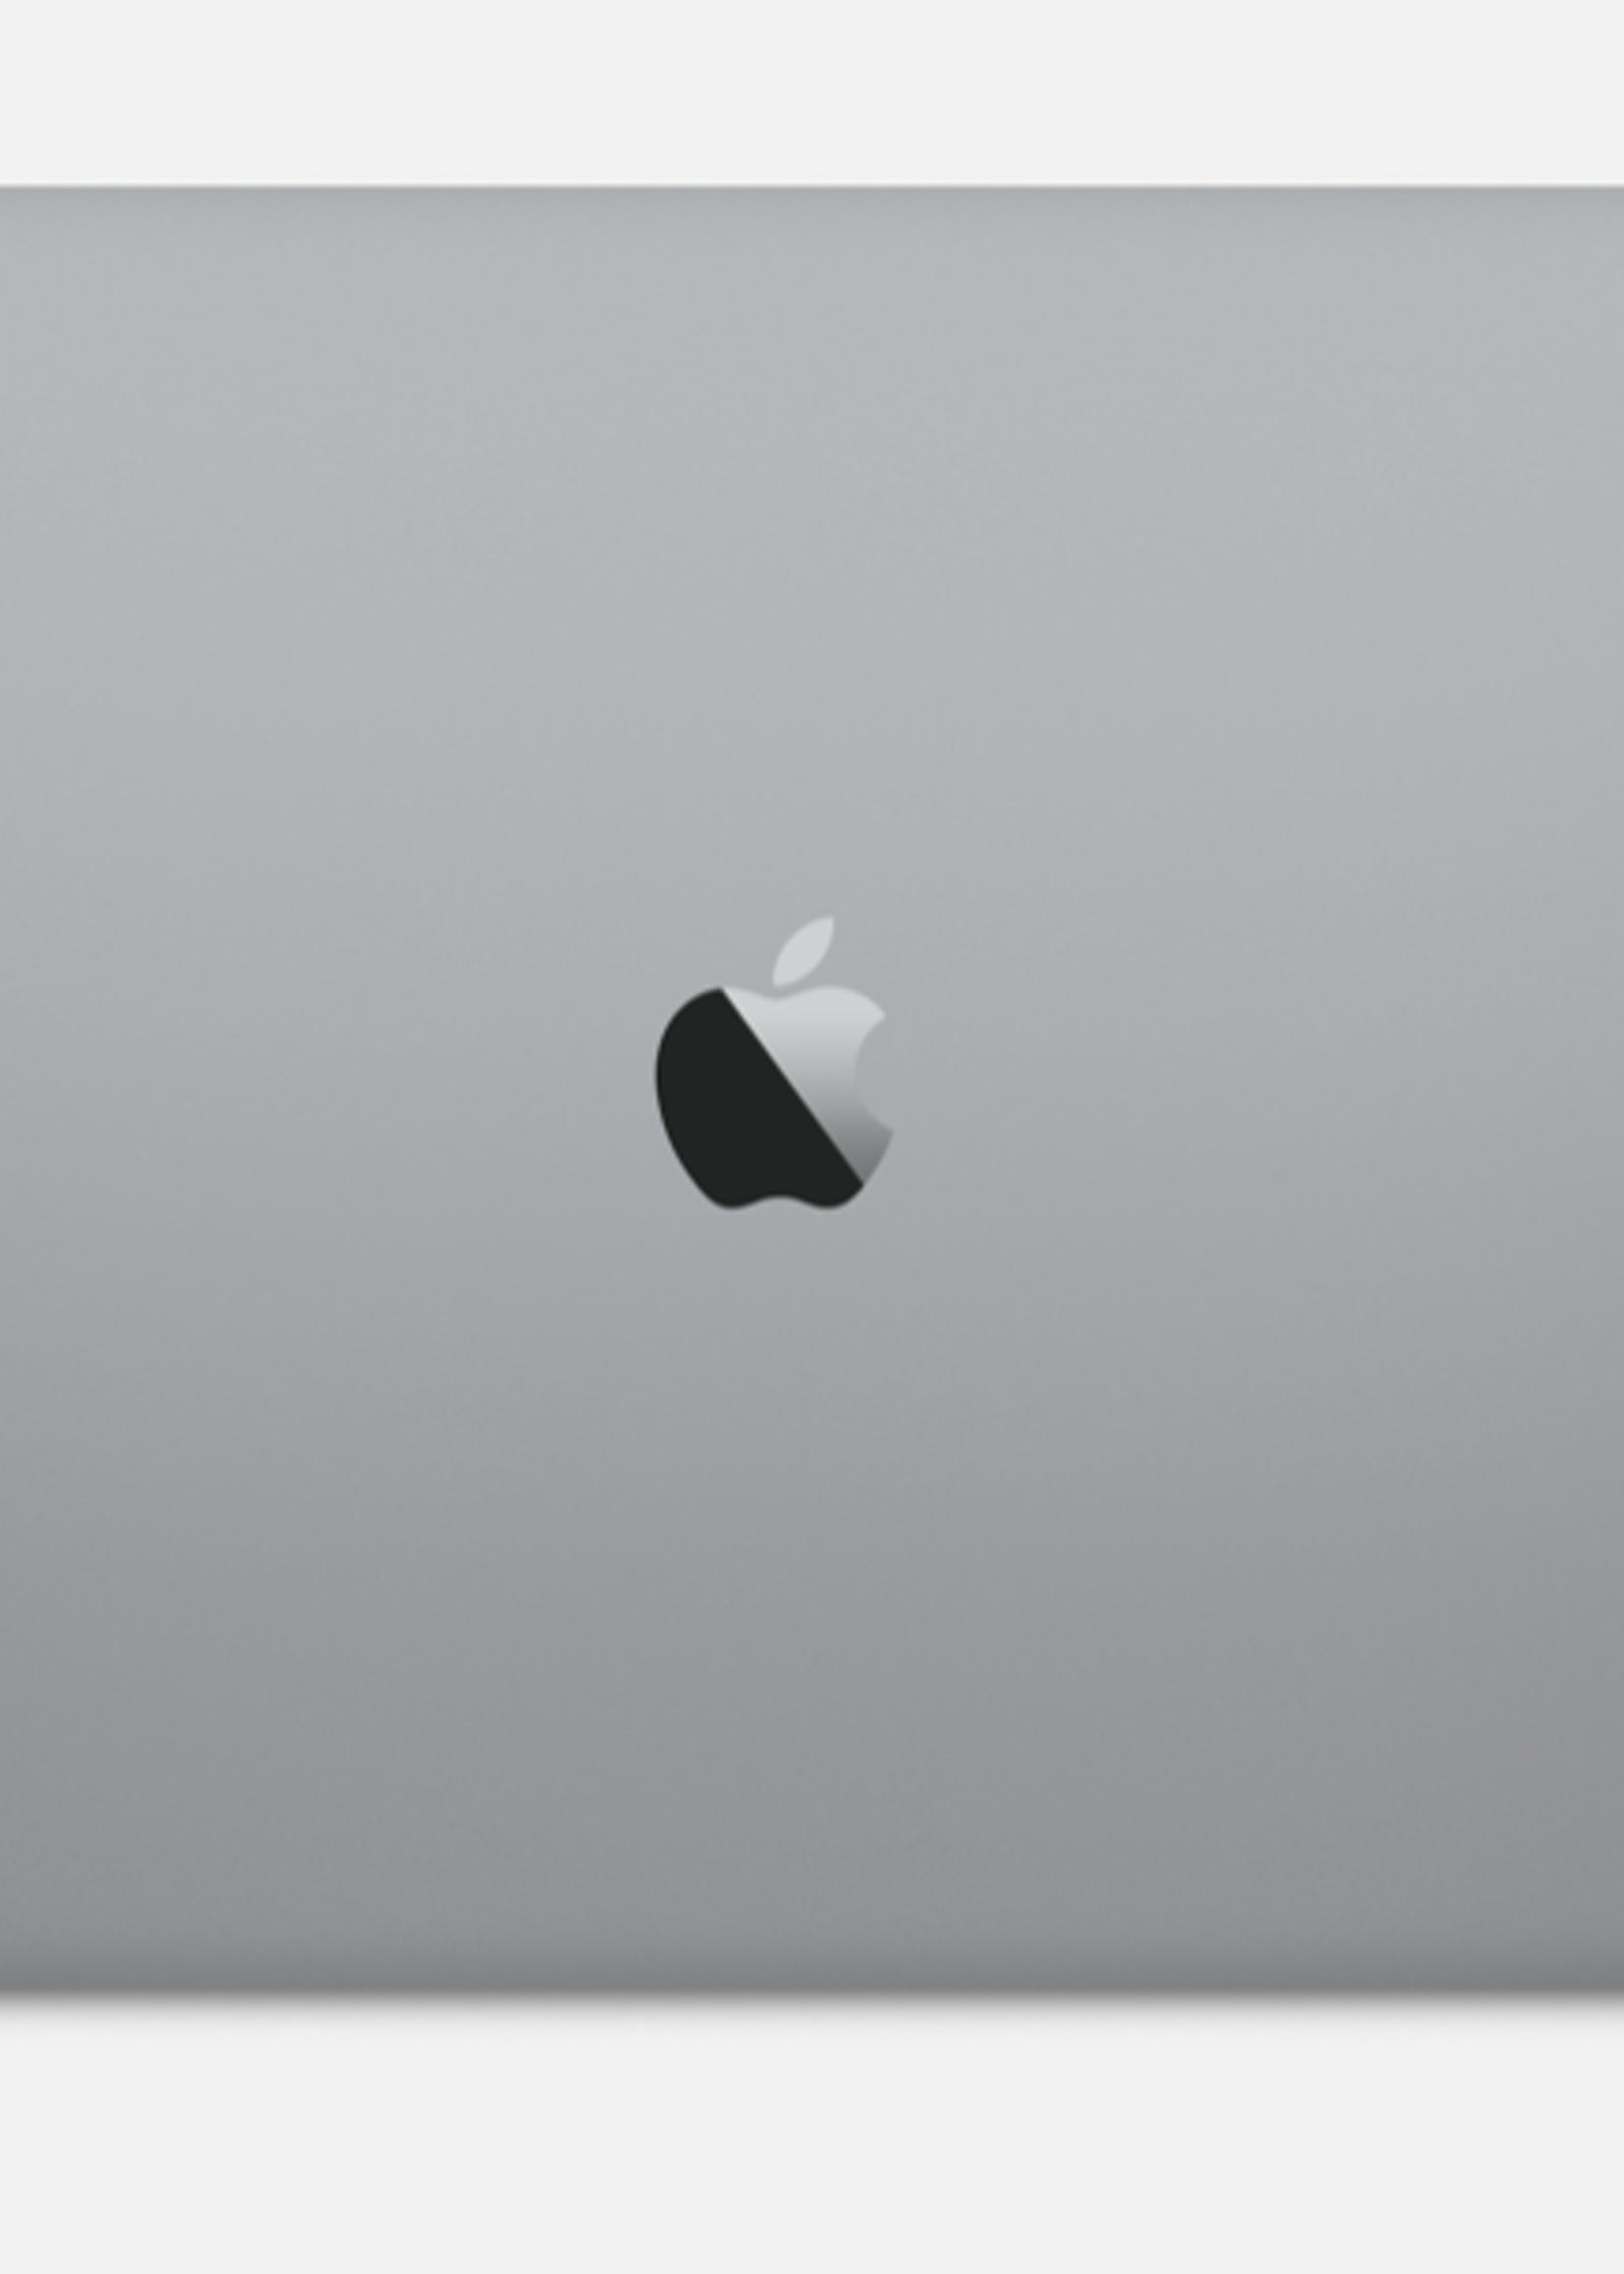 "2019 15"" Macbook Pro 512GB Space Gray"